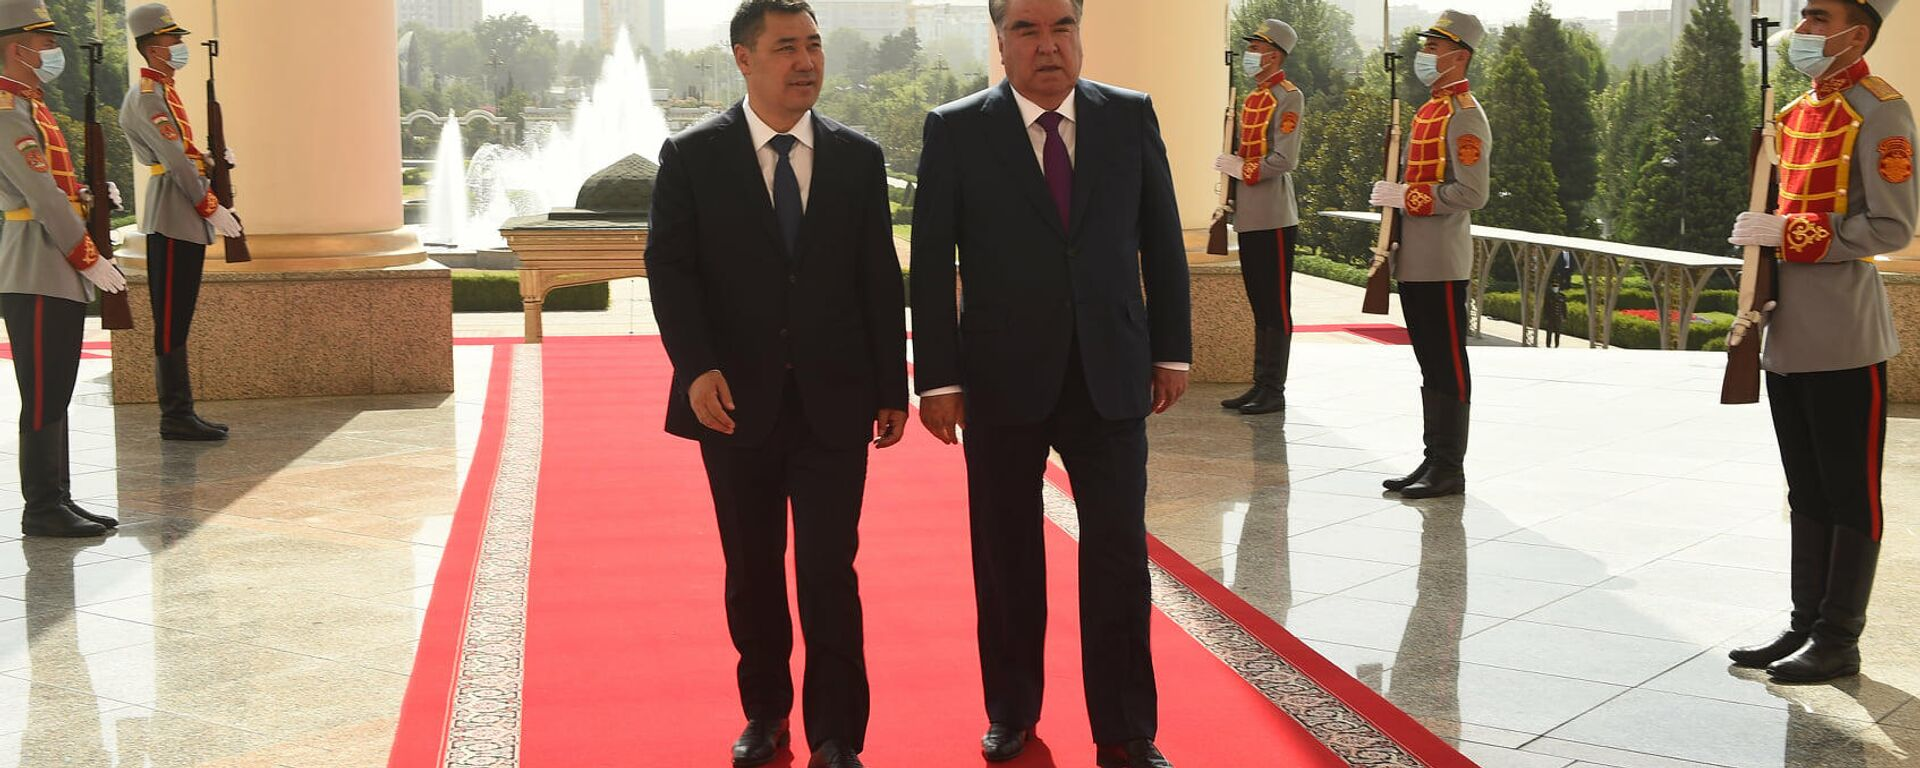 Президент Таджикистан Эмомали Рахмон и президент Кыргызстана Содир Джабборов - Sputnik Тоҷикистон, 1920, 30.08.2021